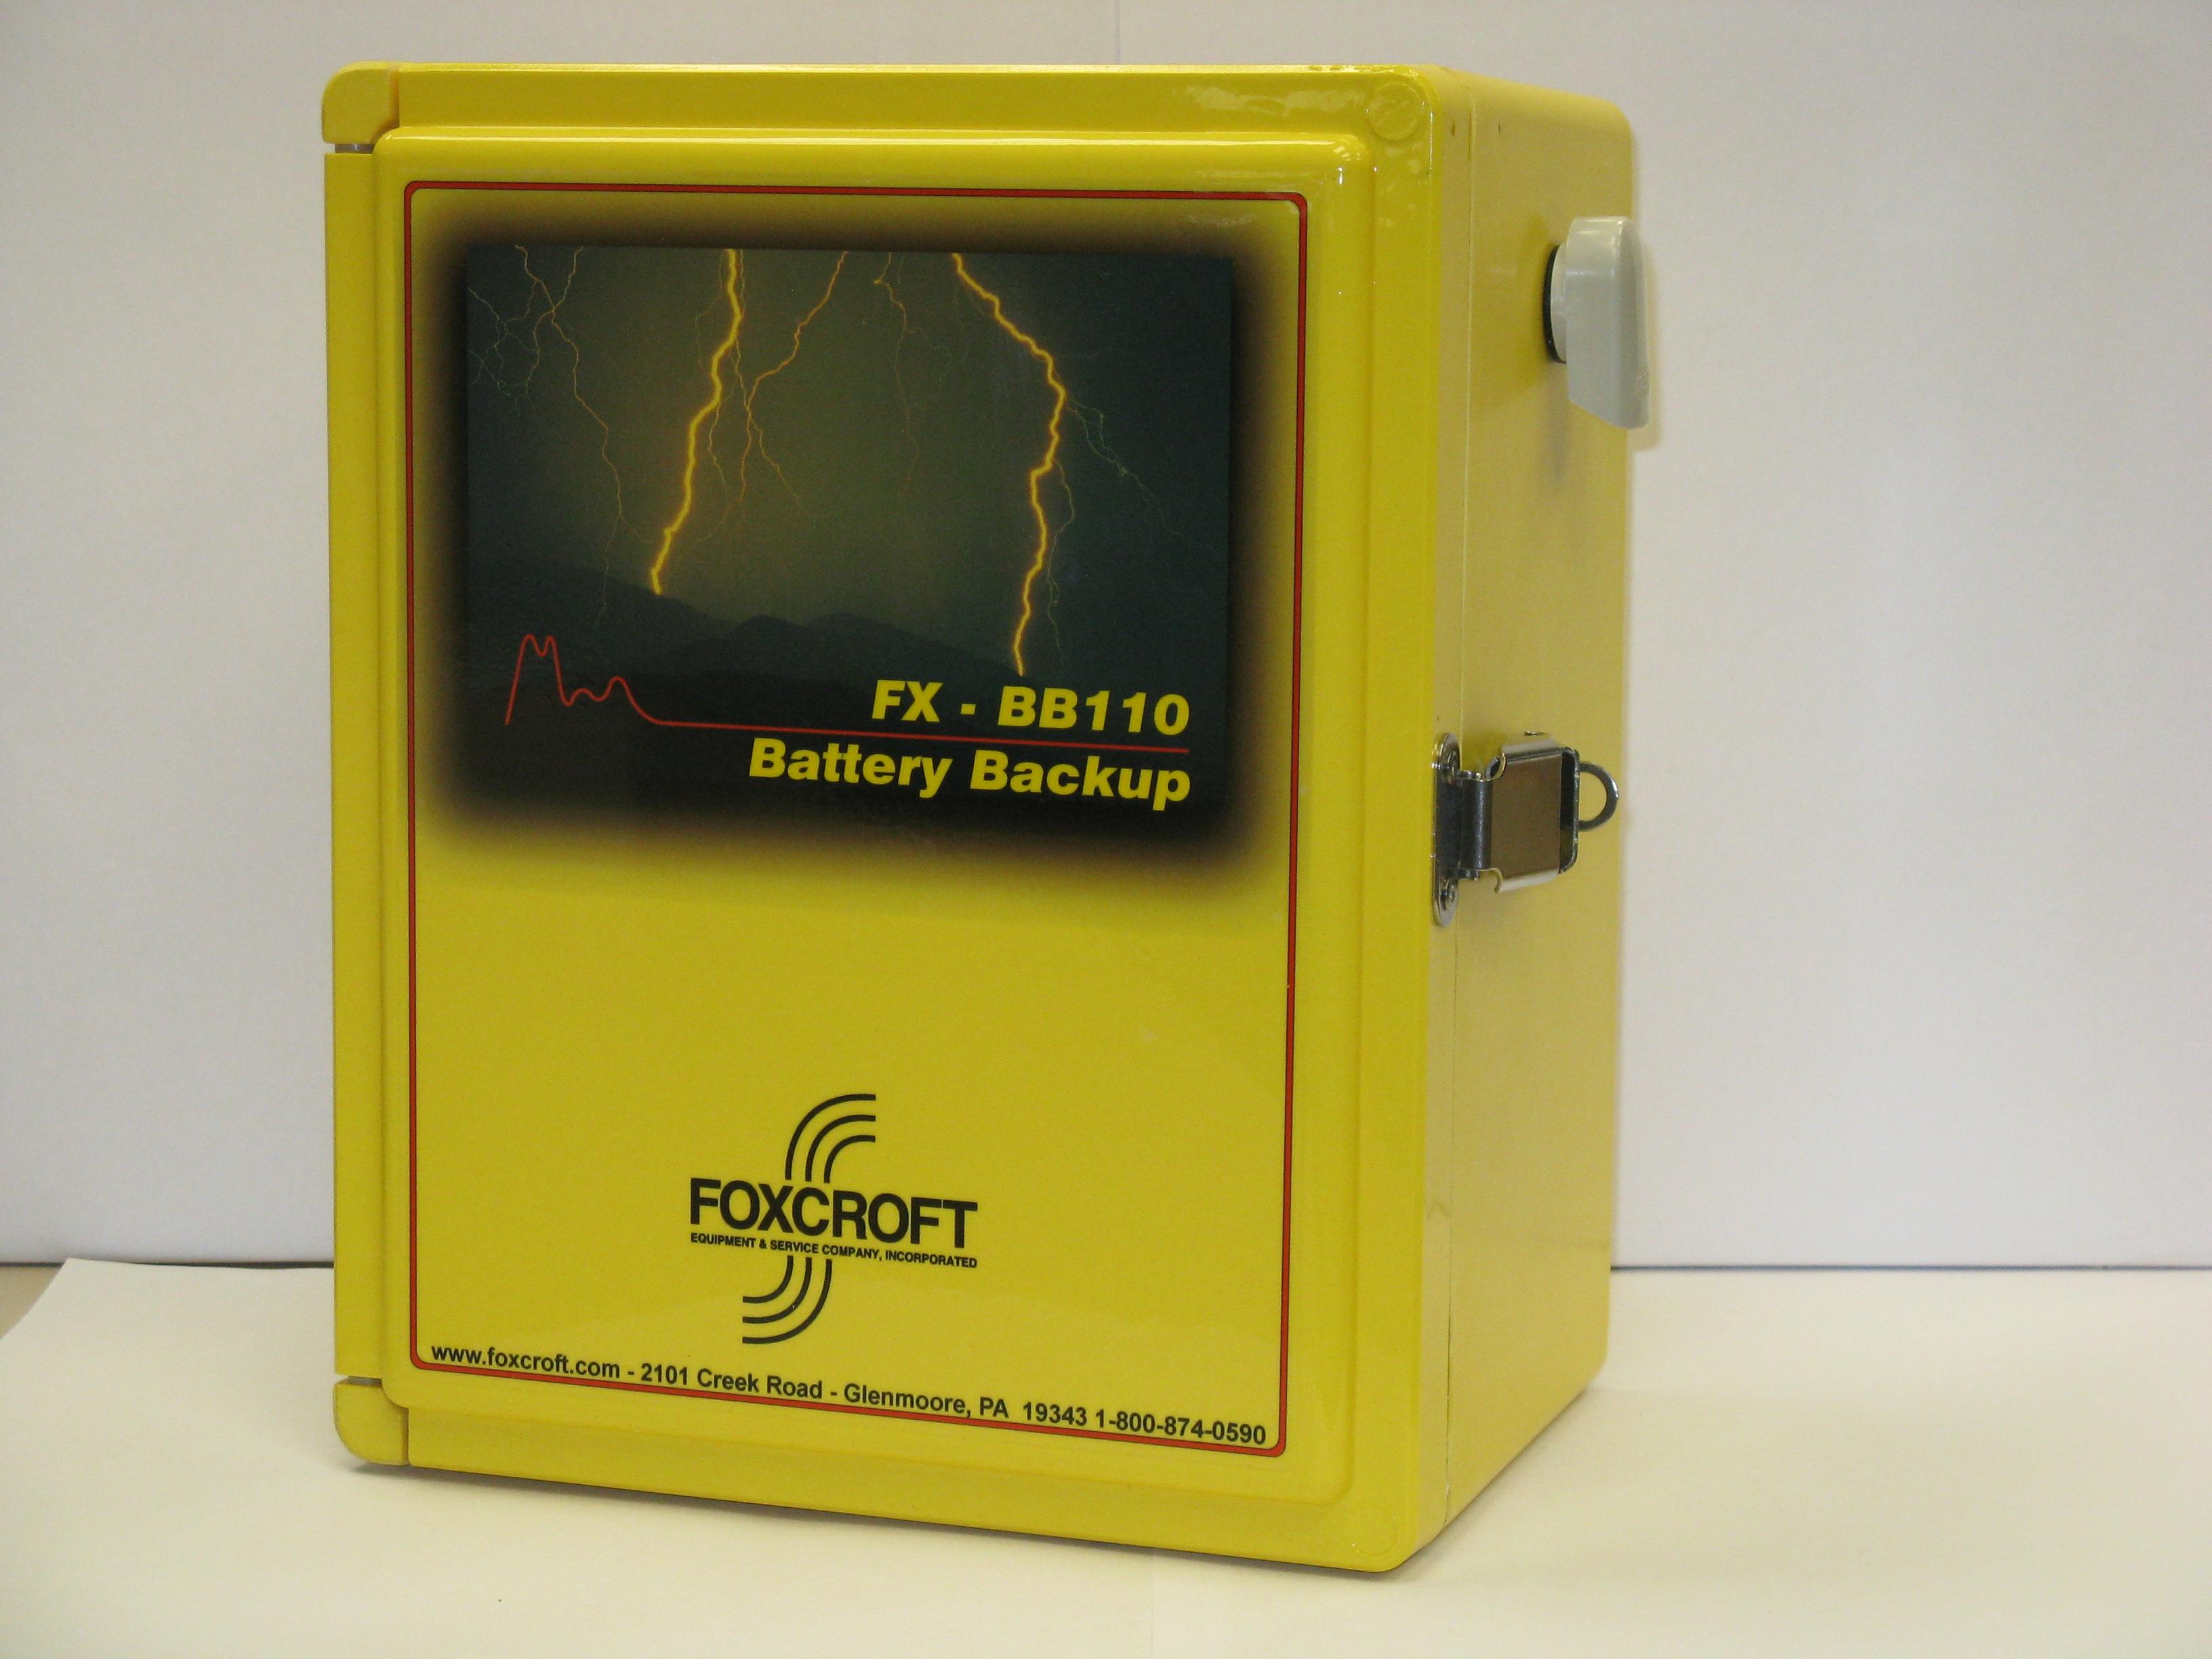 FXBB110_batterybackup 006.jpg